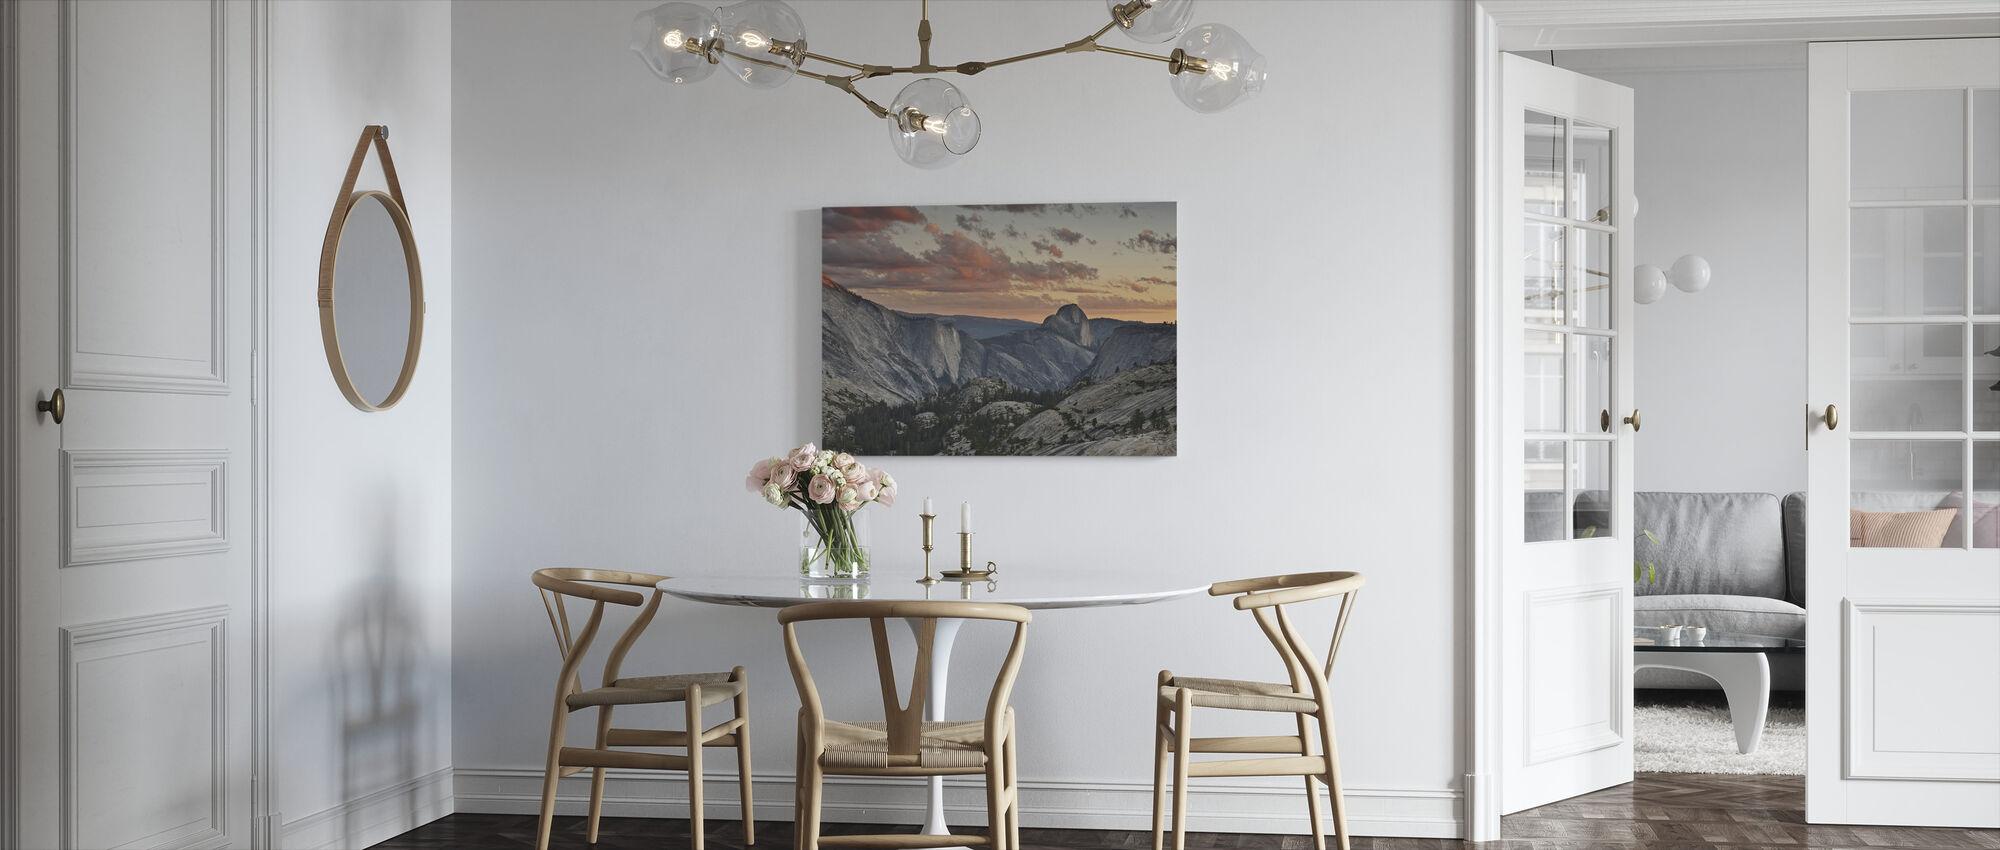 Yosemite landschap - Canvas print - Keuken